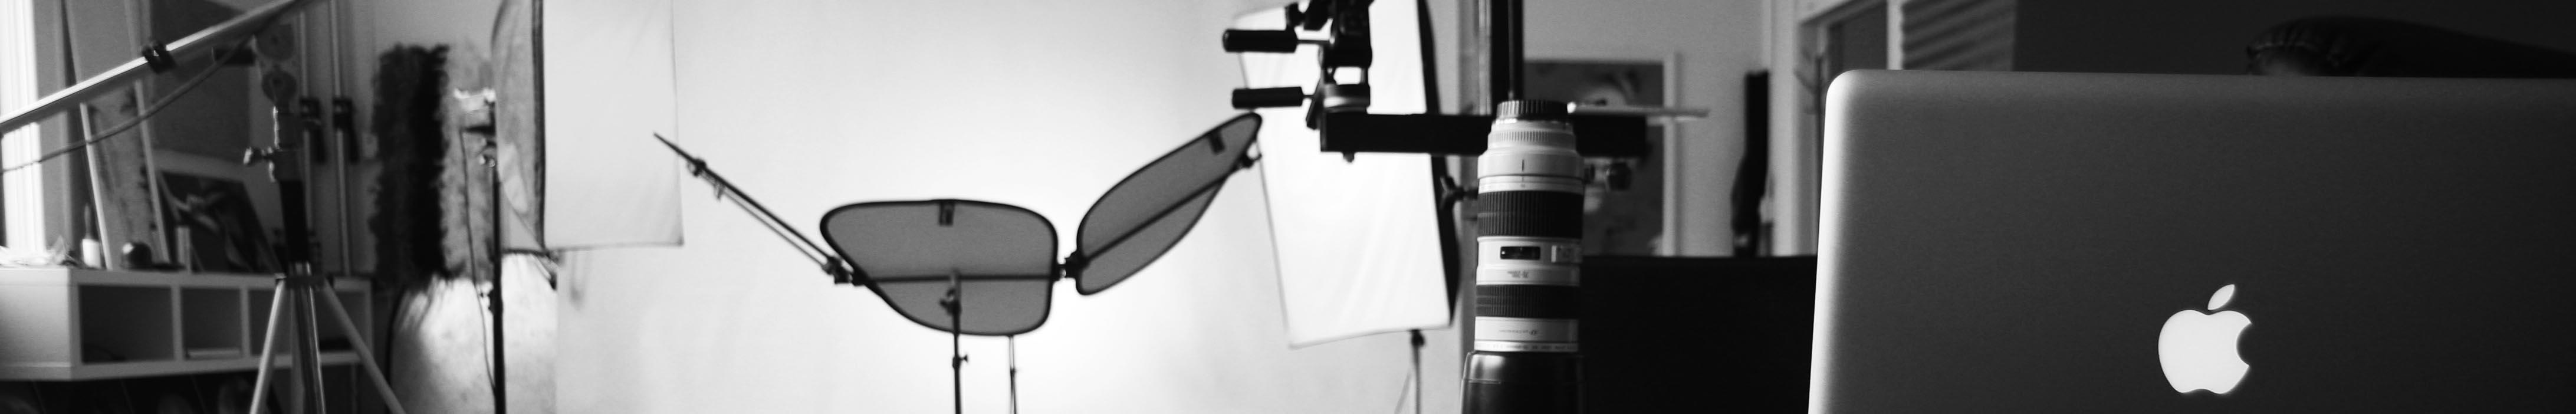 Greenville HeadShots studio